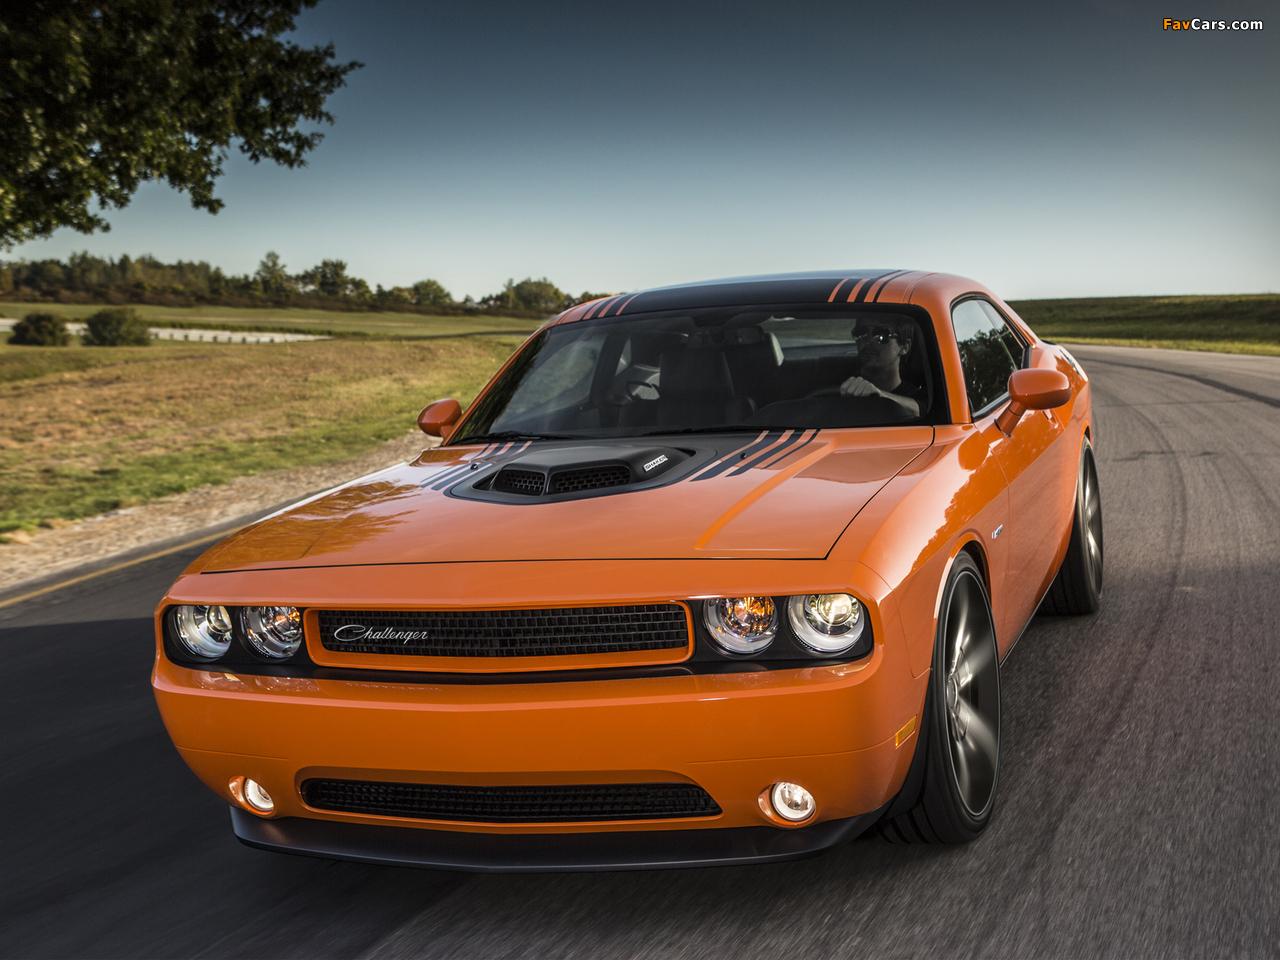 Dodge Challenger R/T Shaker 2014 images (1280 x 960)